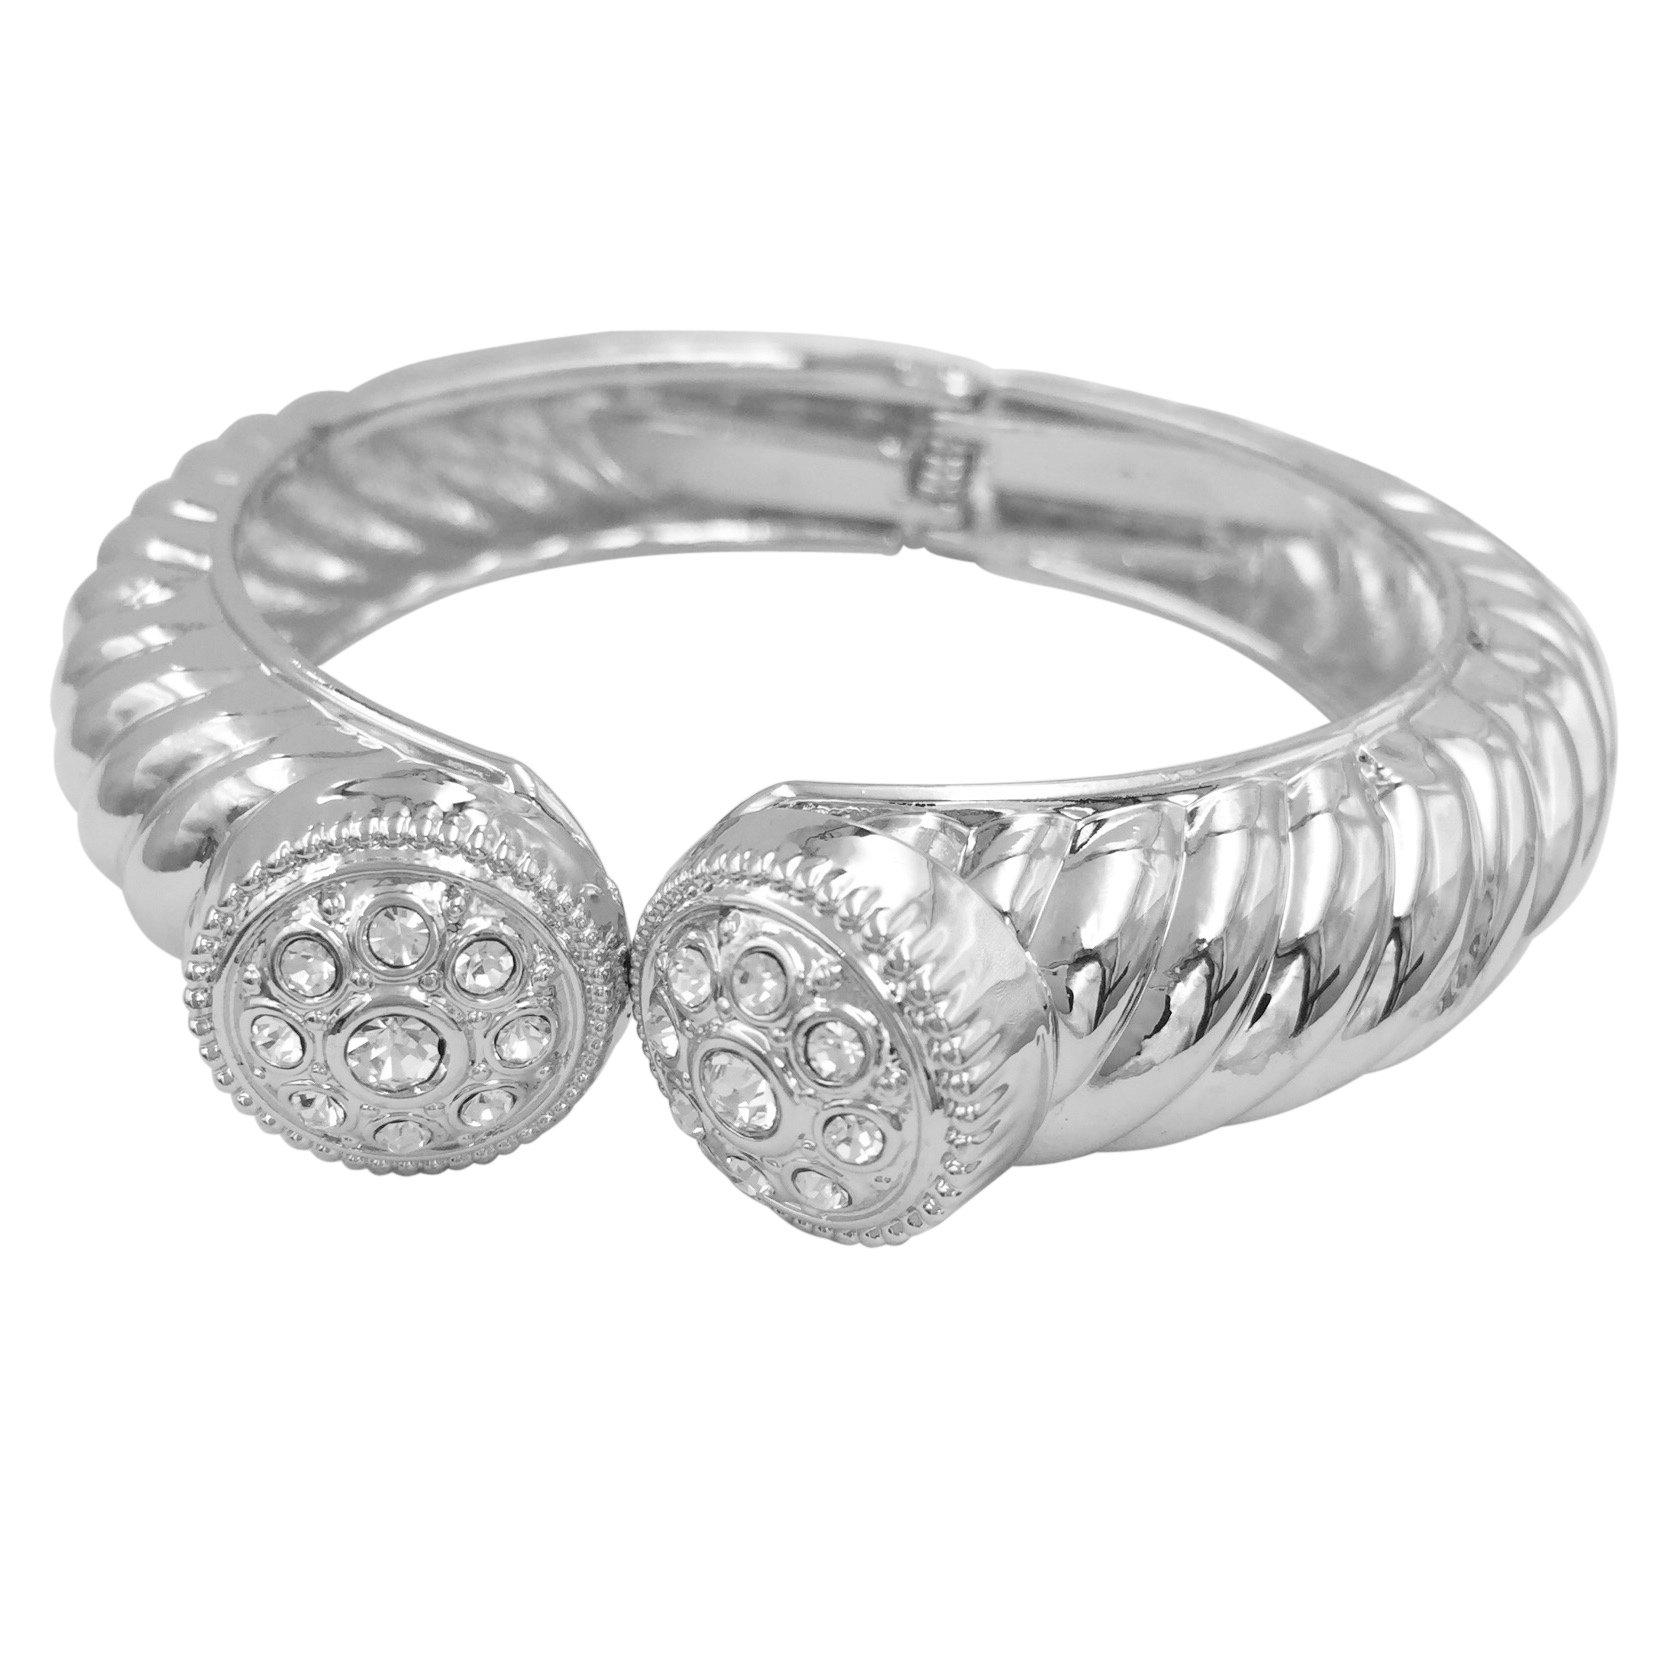 Gypsy Jewels Patterned Silver Tone Designer Look Hinged Bangle Bracelet (Round Top Rhinestone)